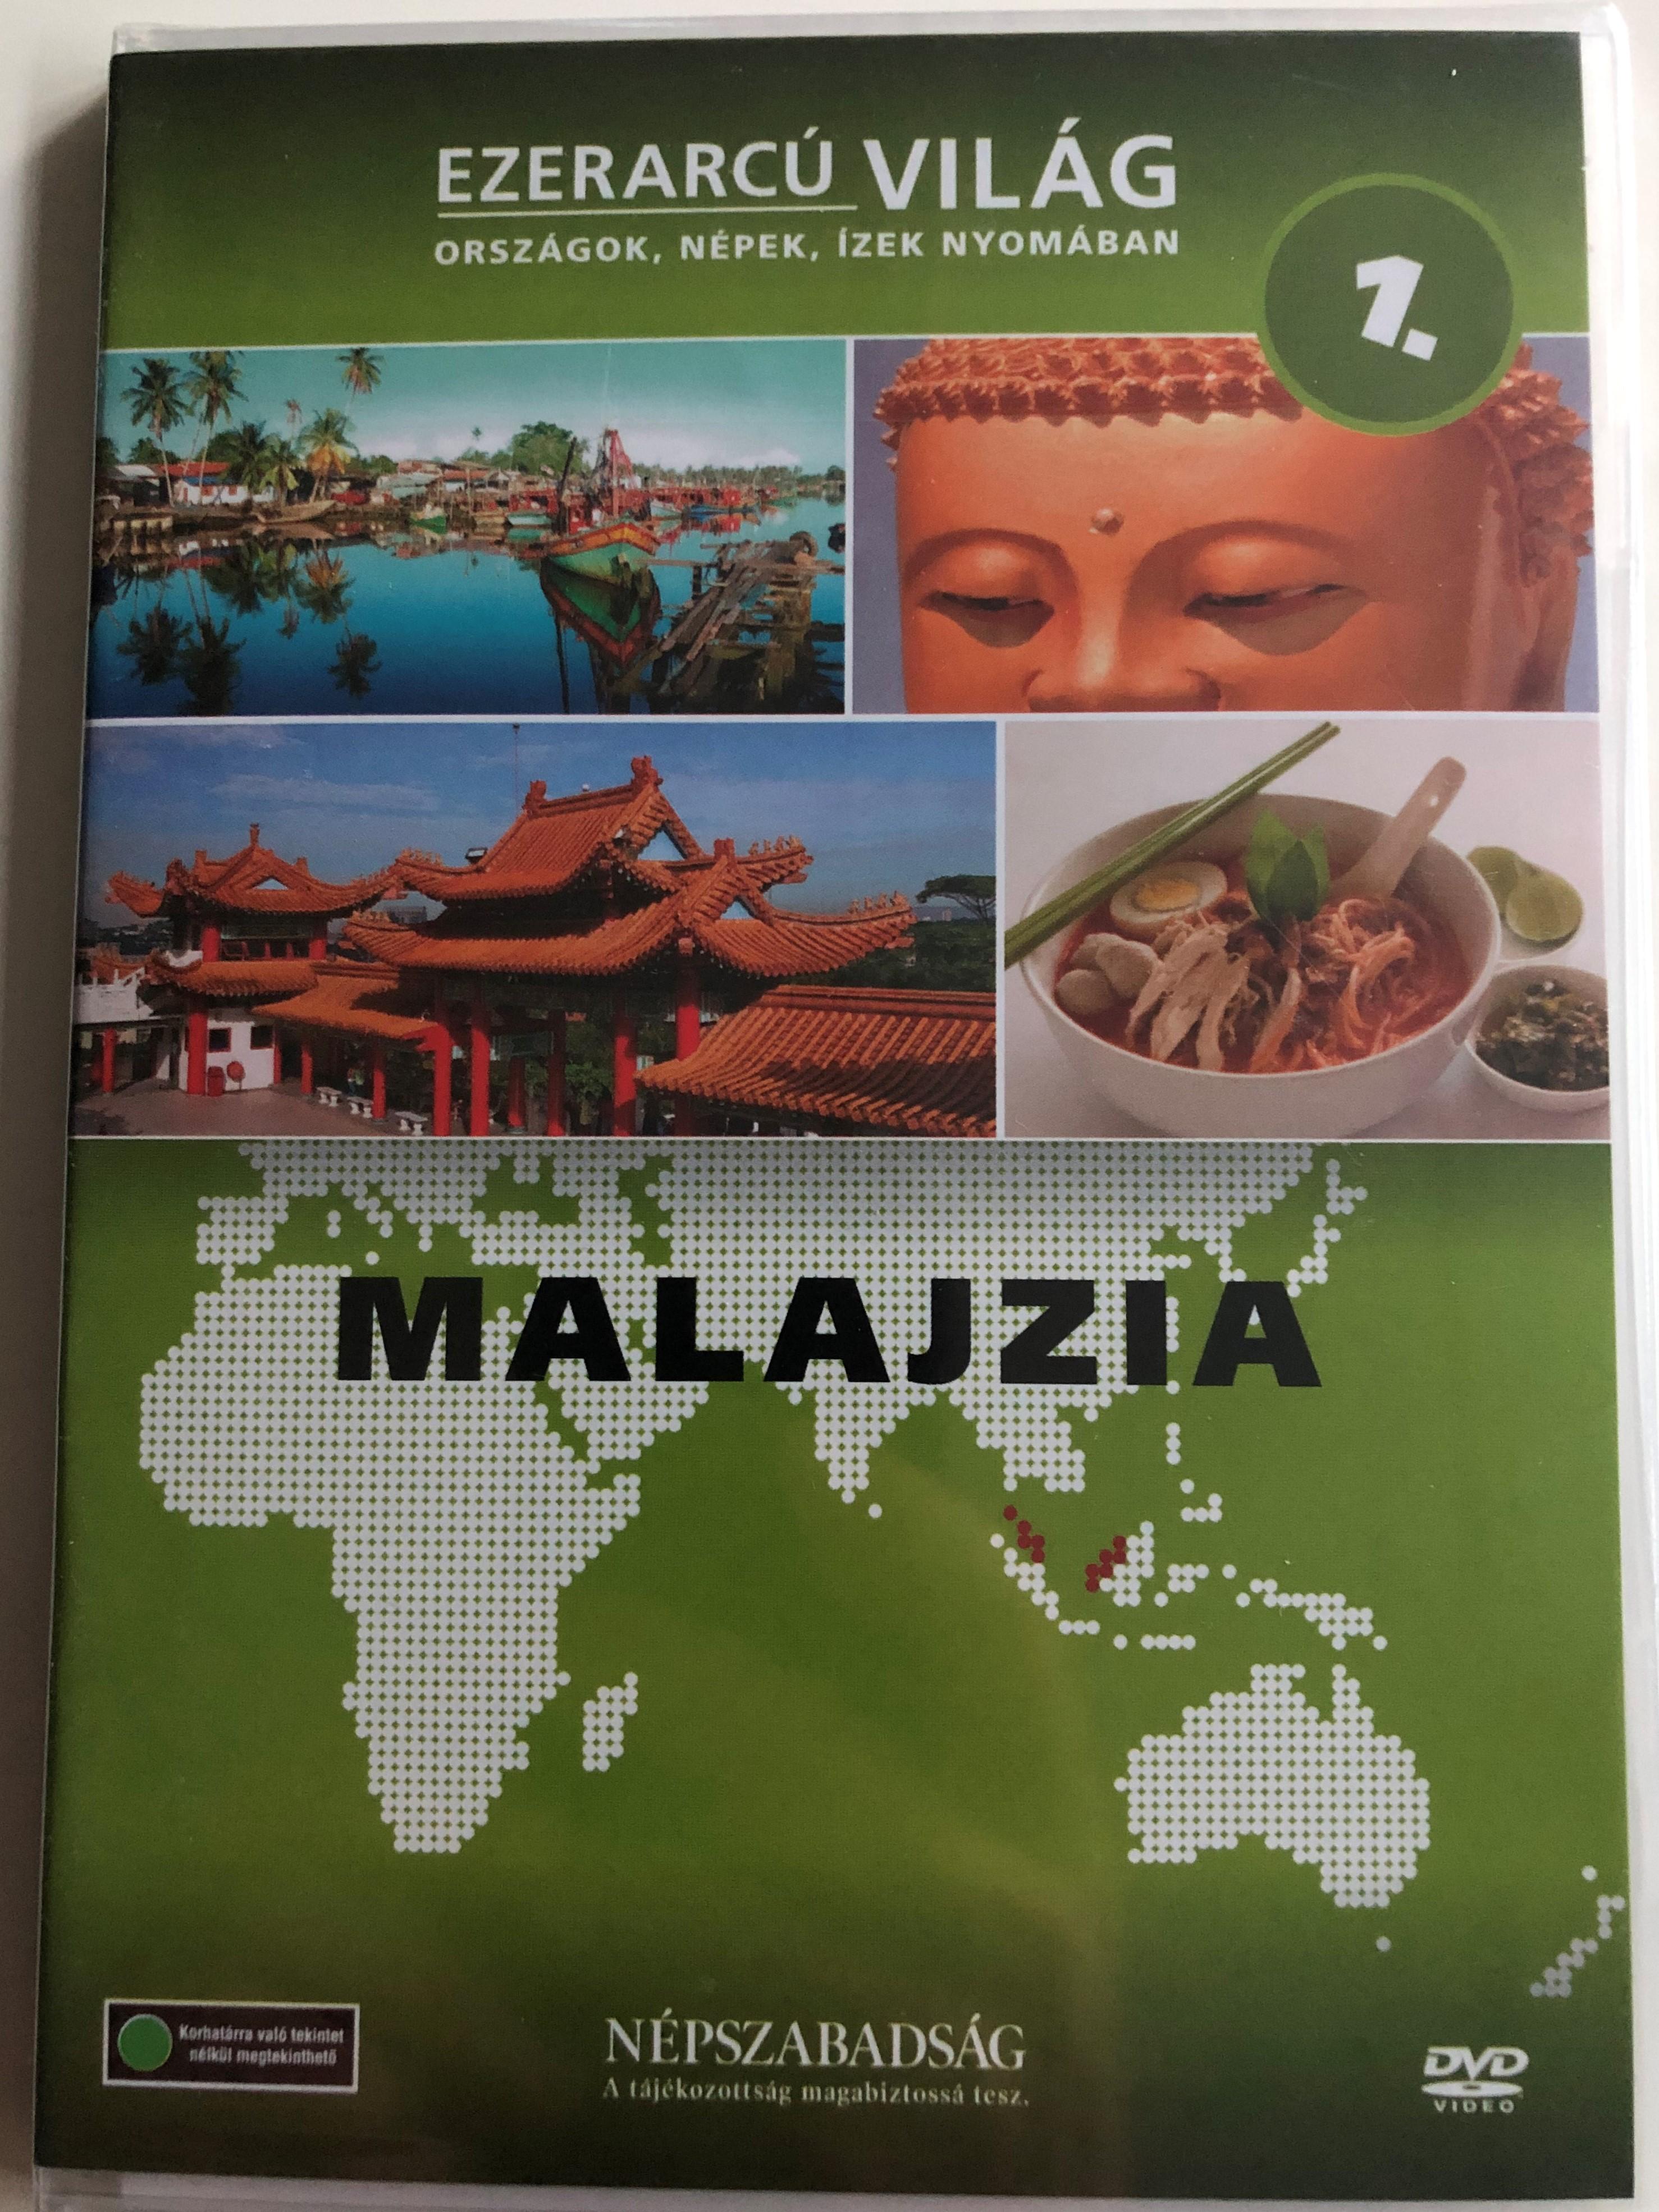 ezerarc-vil-g-vol.-1-malajzia-malaysia-dvd-2009-orsz-gok-n-pek-zek-nyom-ban-20-x-dvd-set-2009-n-pszabads-g-premier-media-pilot-film-documentary-series-about-our-world-1-.jpg